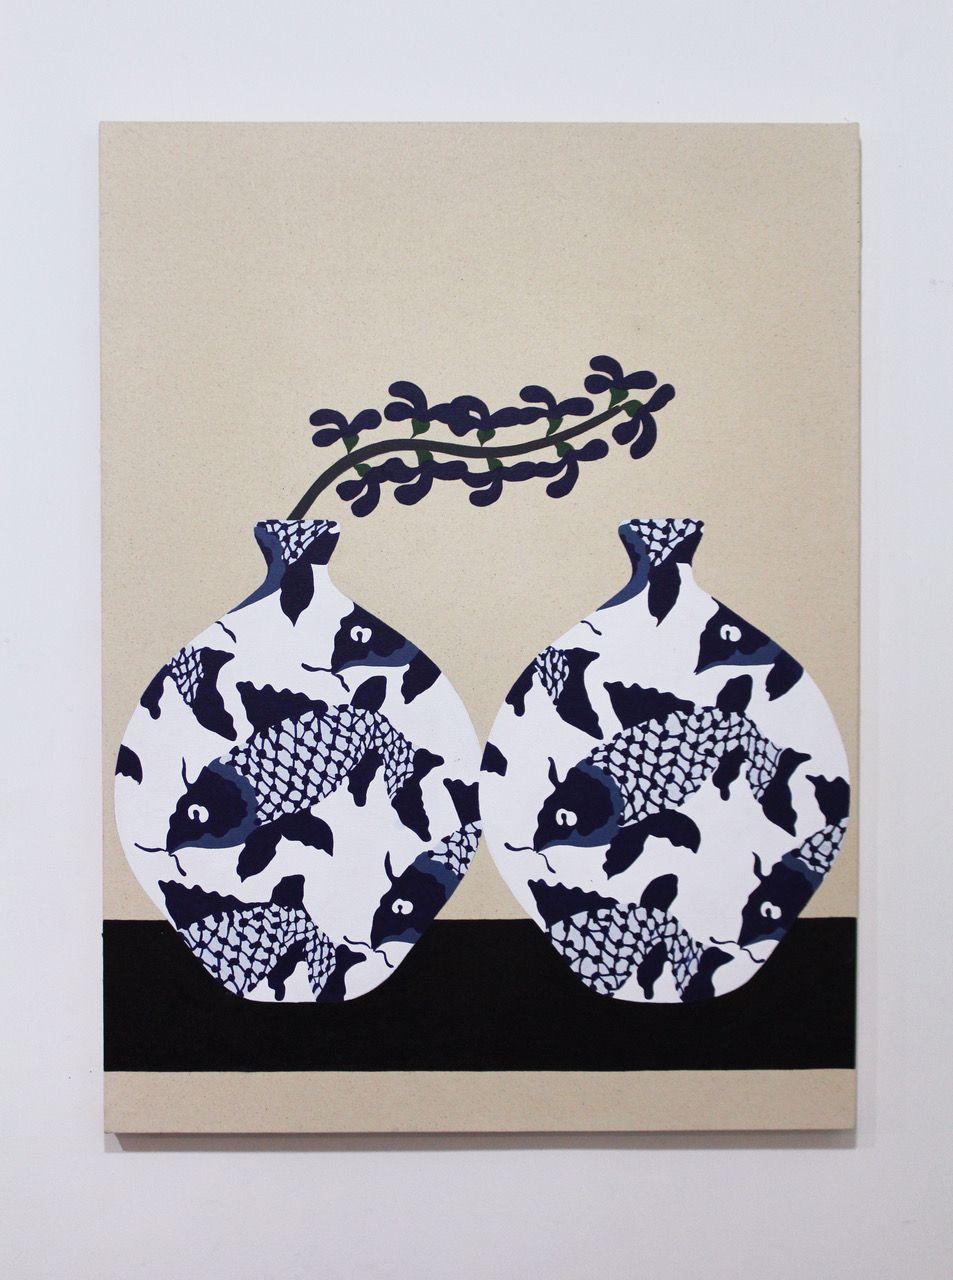 Fish Vase 2018 acrylic on canvas 40x30